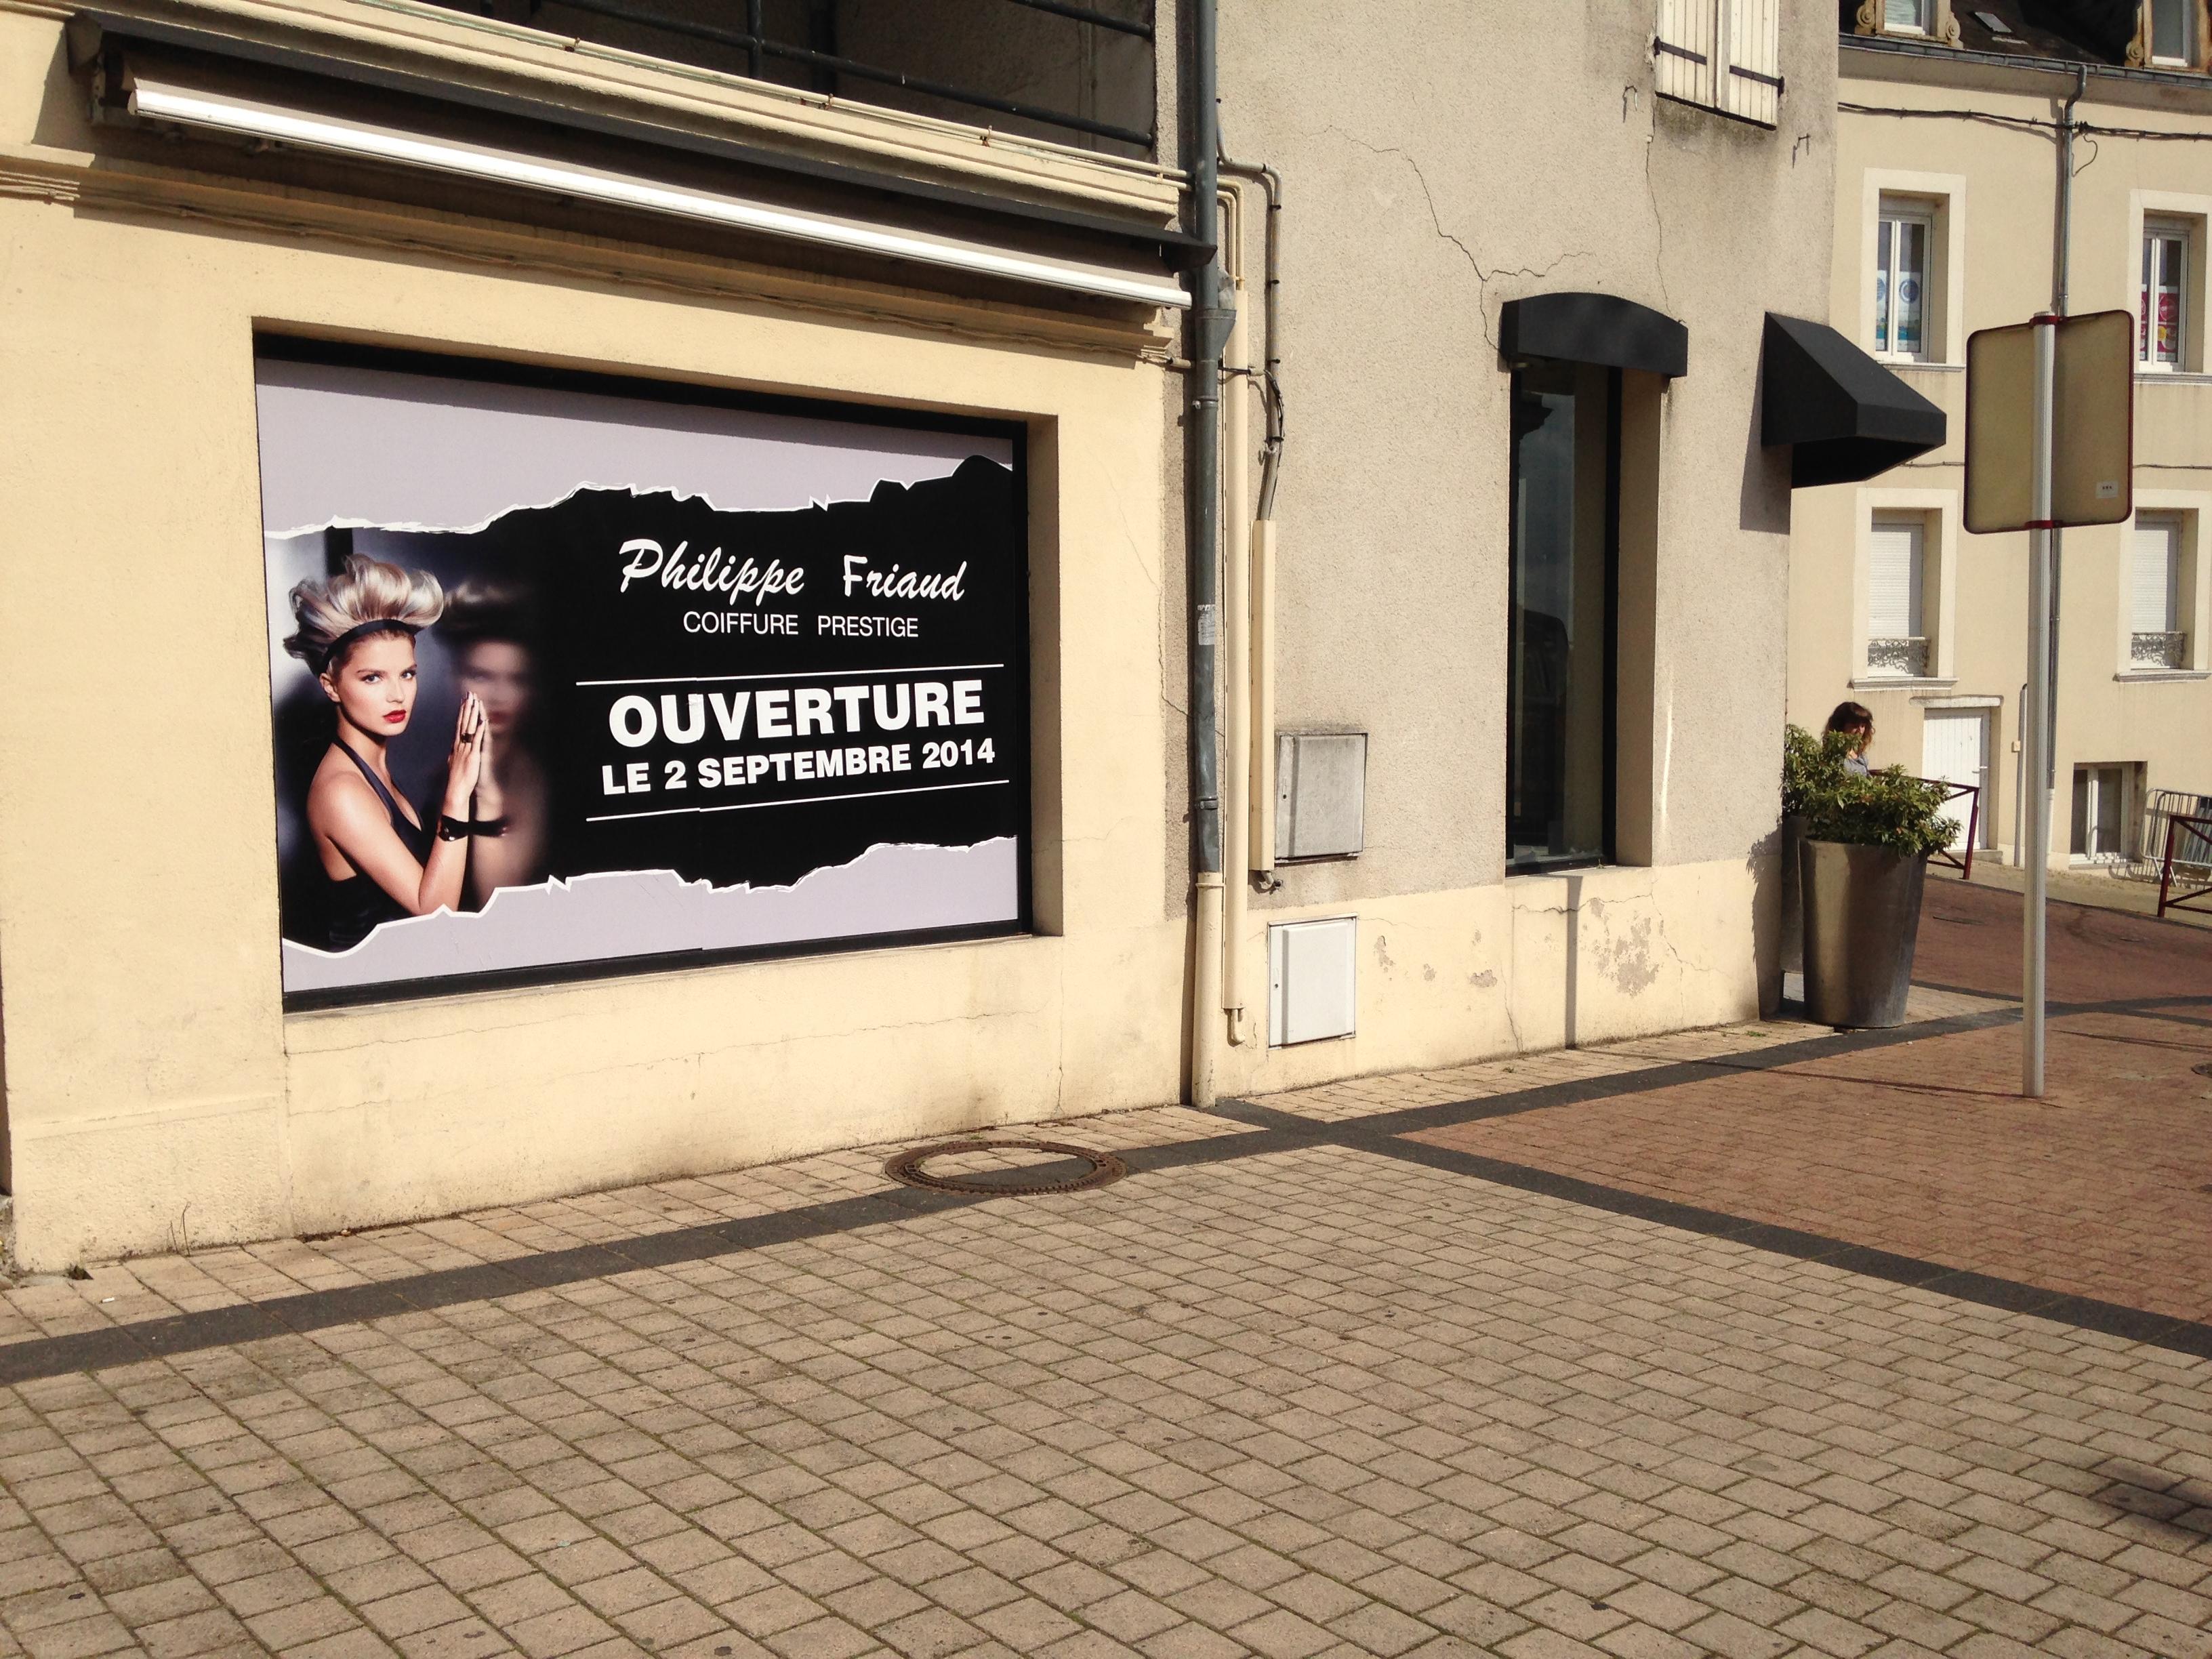 teasing pendant travaux salon de coiffure Philippe Friaud Prestige Vierzon